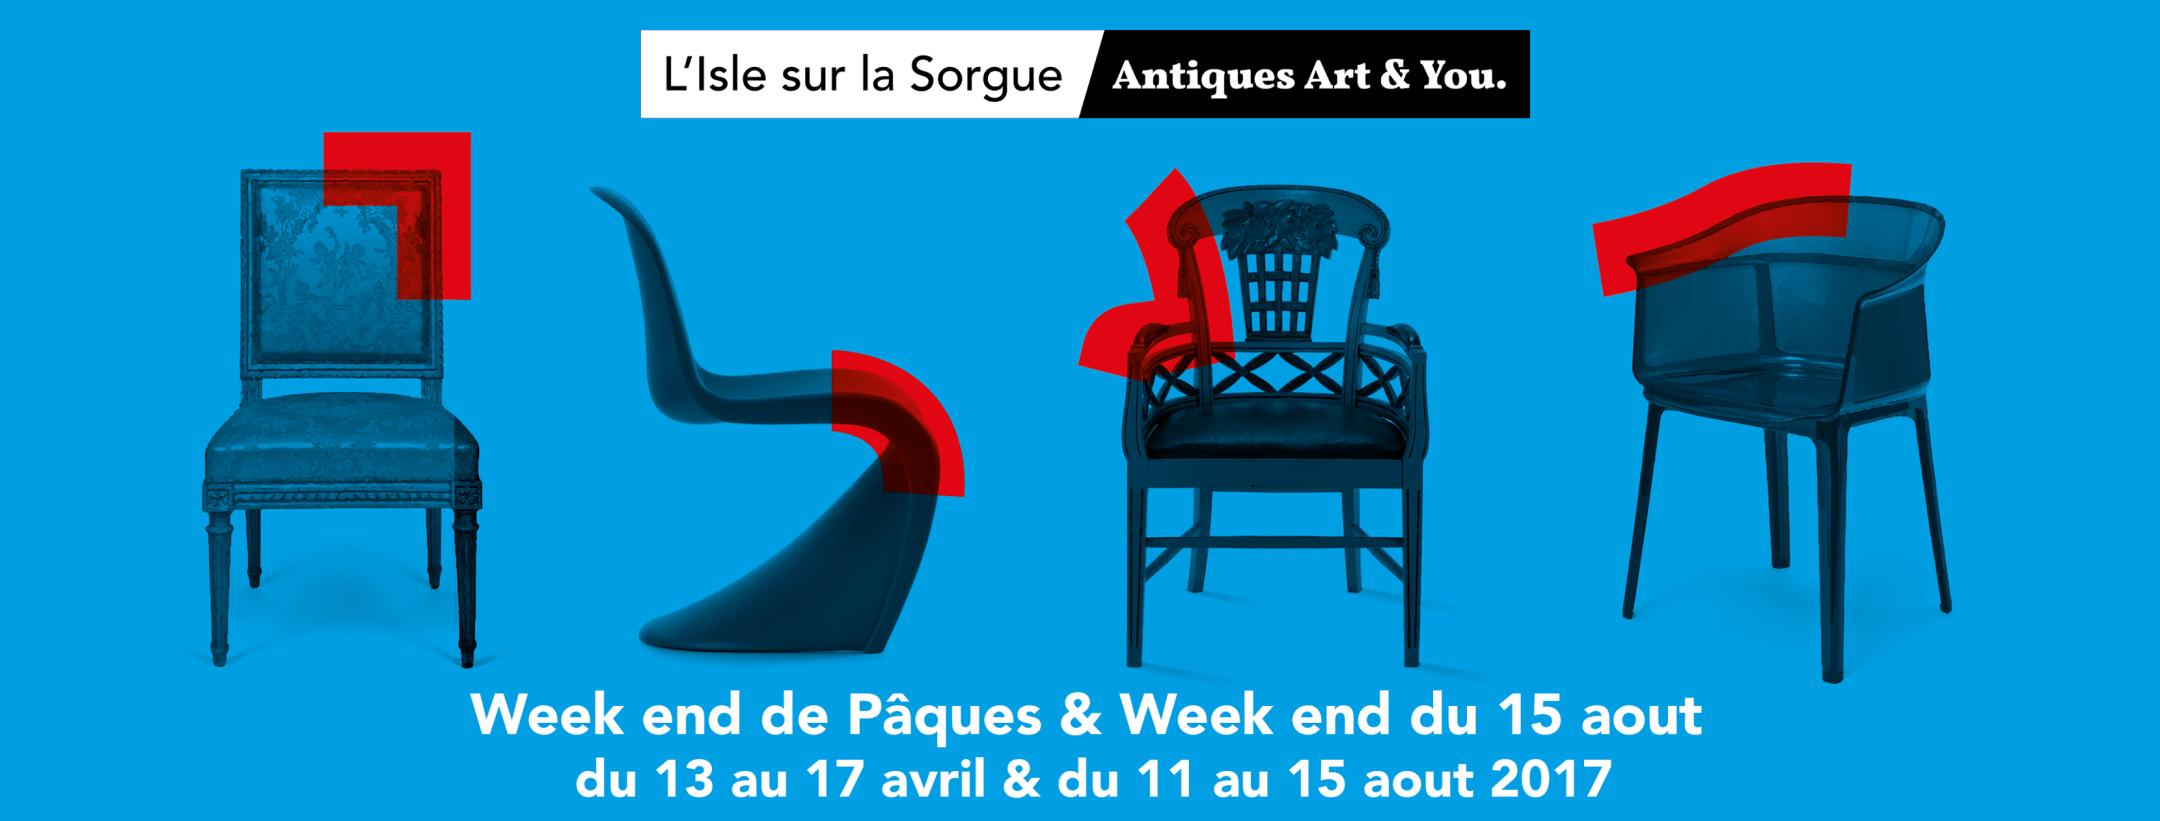 islesurlasorgues13 17avril2017 brocanteandco boutique. Black Bedroom Furniture Sets. Home Design Ideas